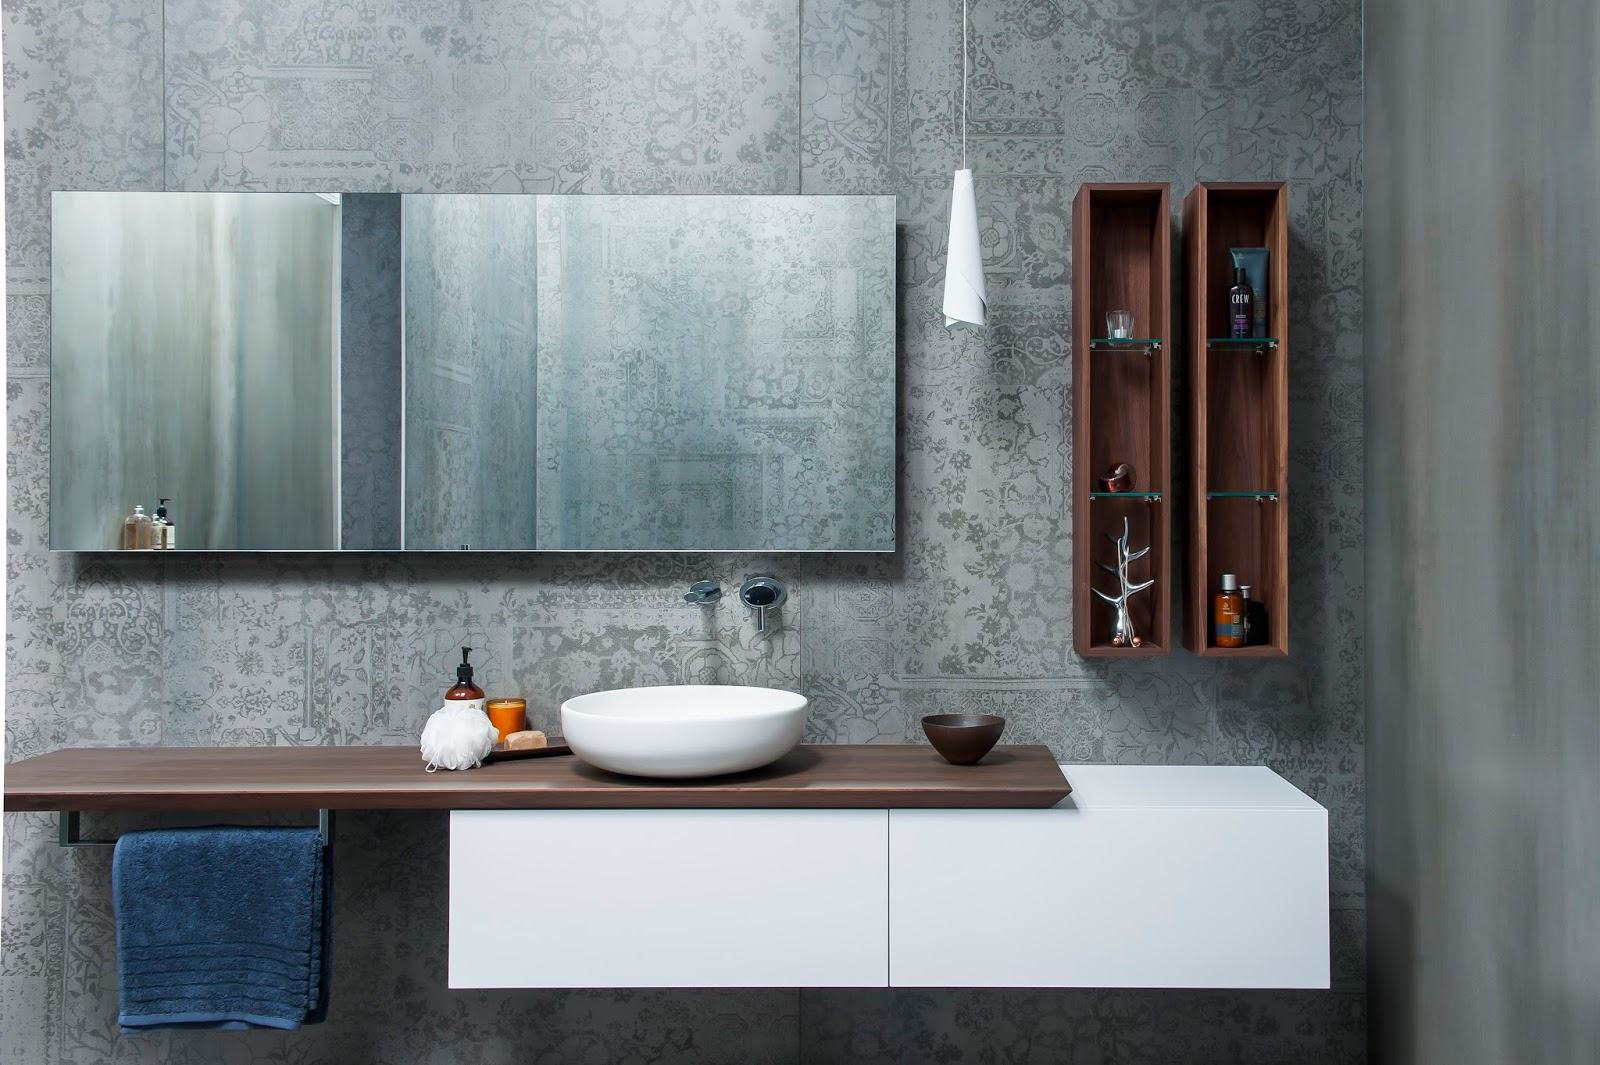 Minosa: Main Bathroom meets Powder Room with stunning result